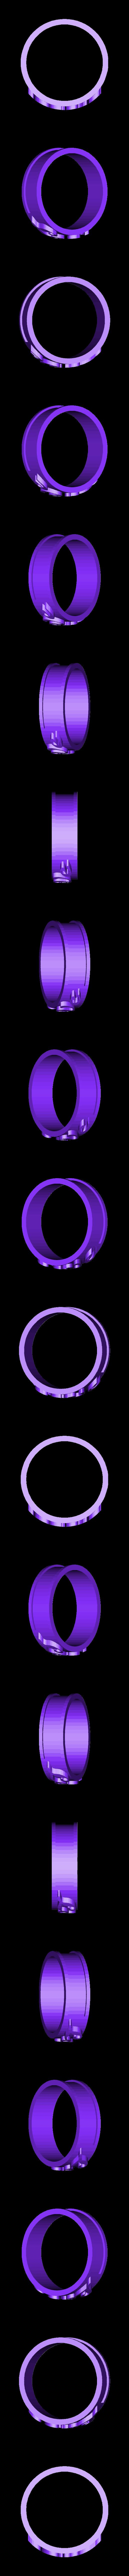 anillo love 21 cerrado hendidura 2.stl Télécharger fichier STL gratuit Anillo / Ring Love • Design pour impression 3D, amg3D